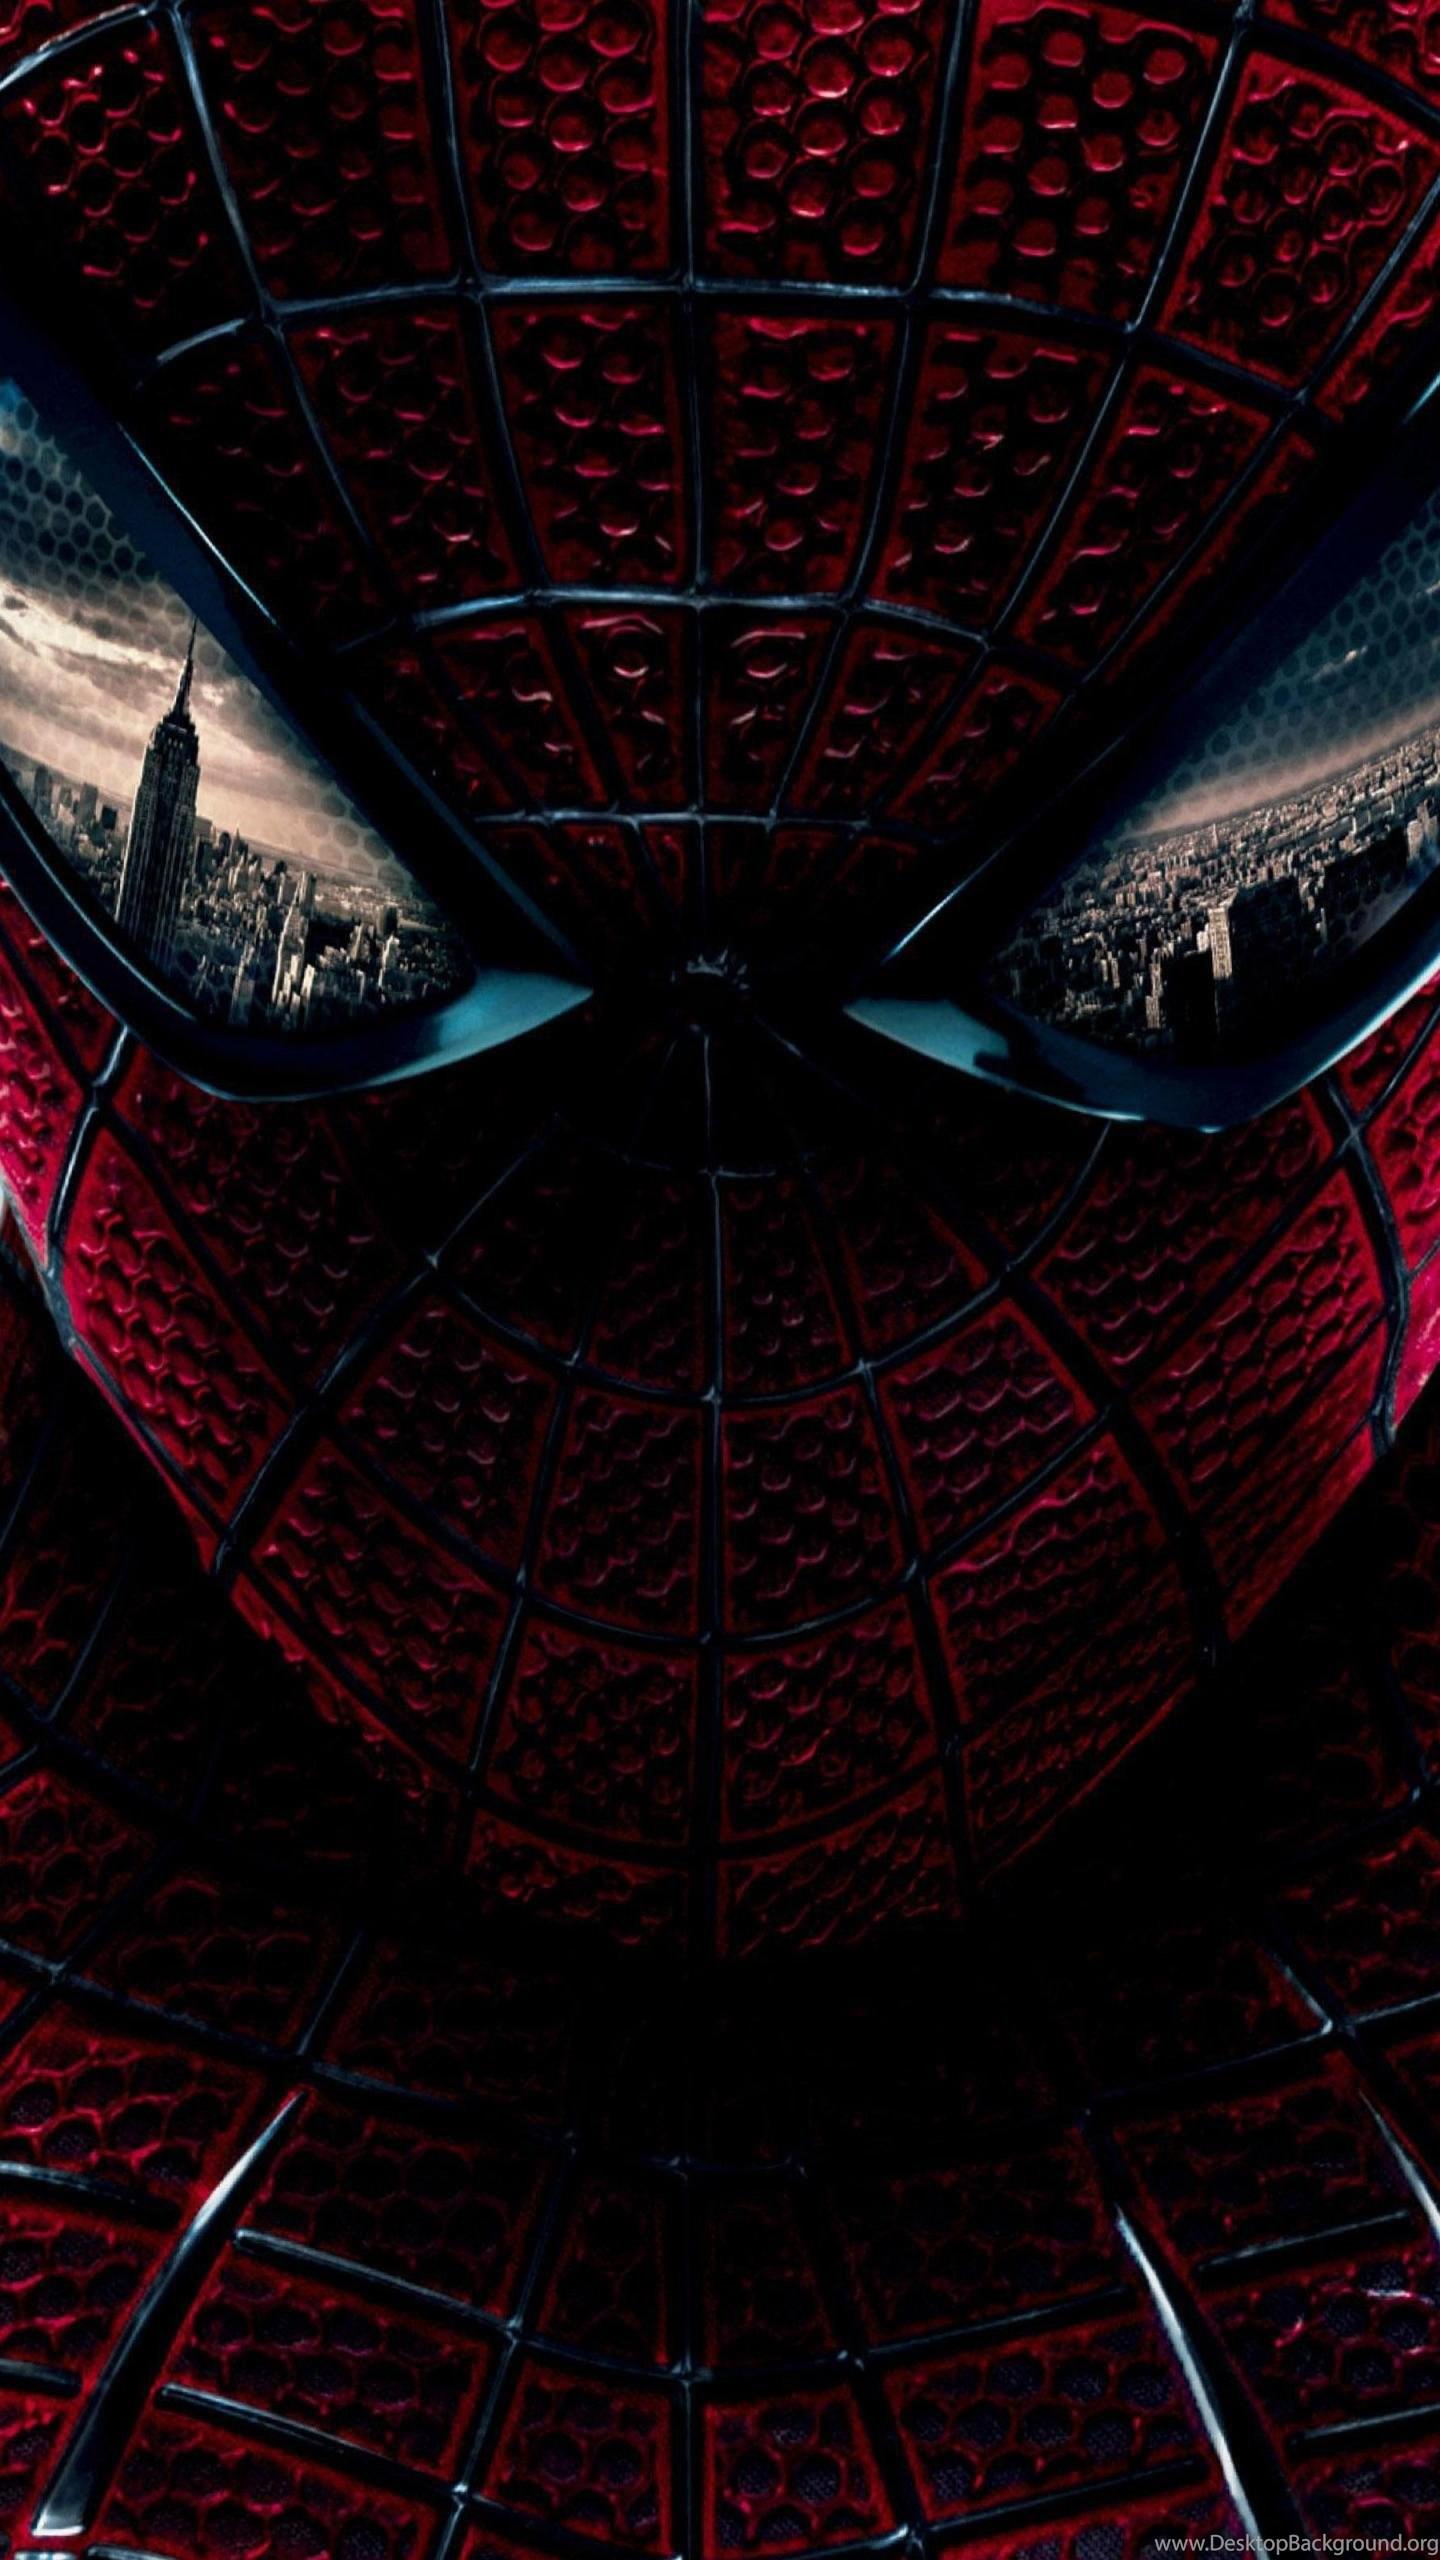 Spiderman Cool Wallpapers For Samsung Galaxy S6 Wallpapersiq Desktop Background